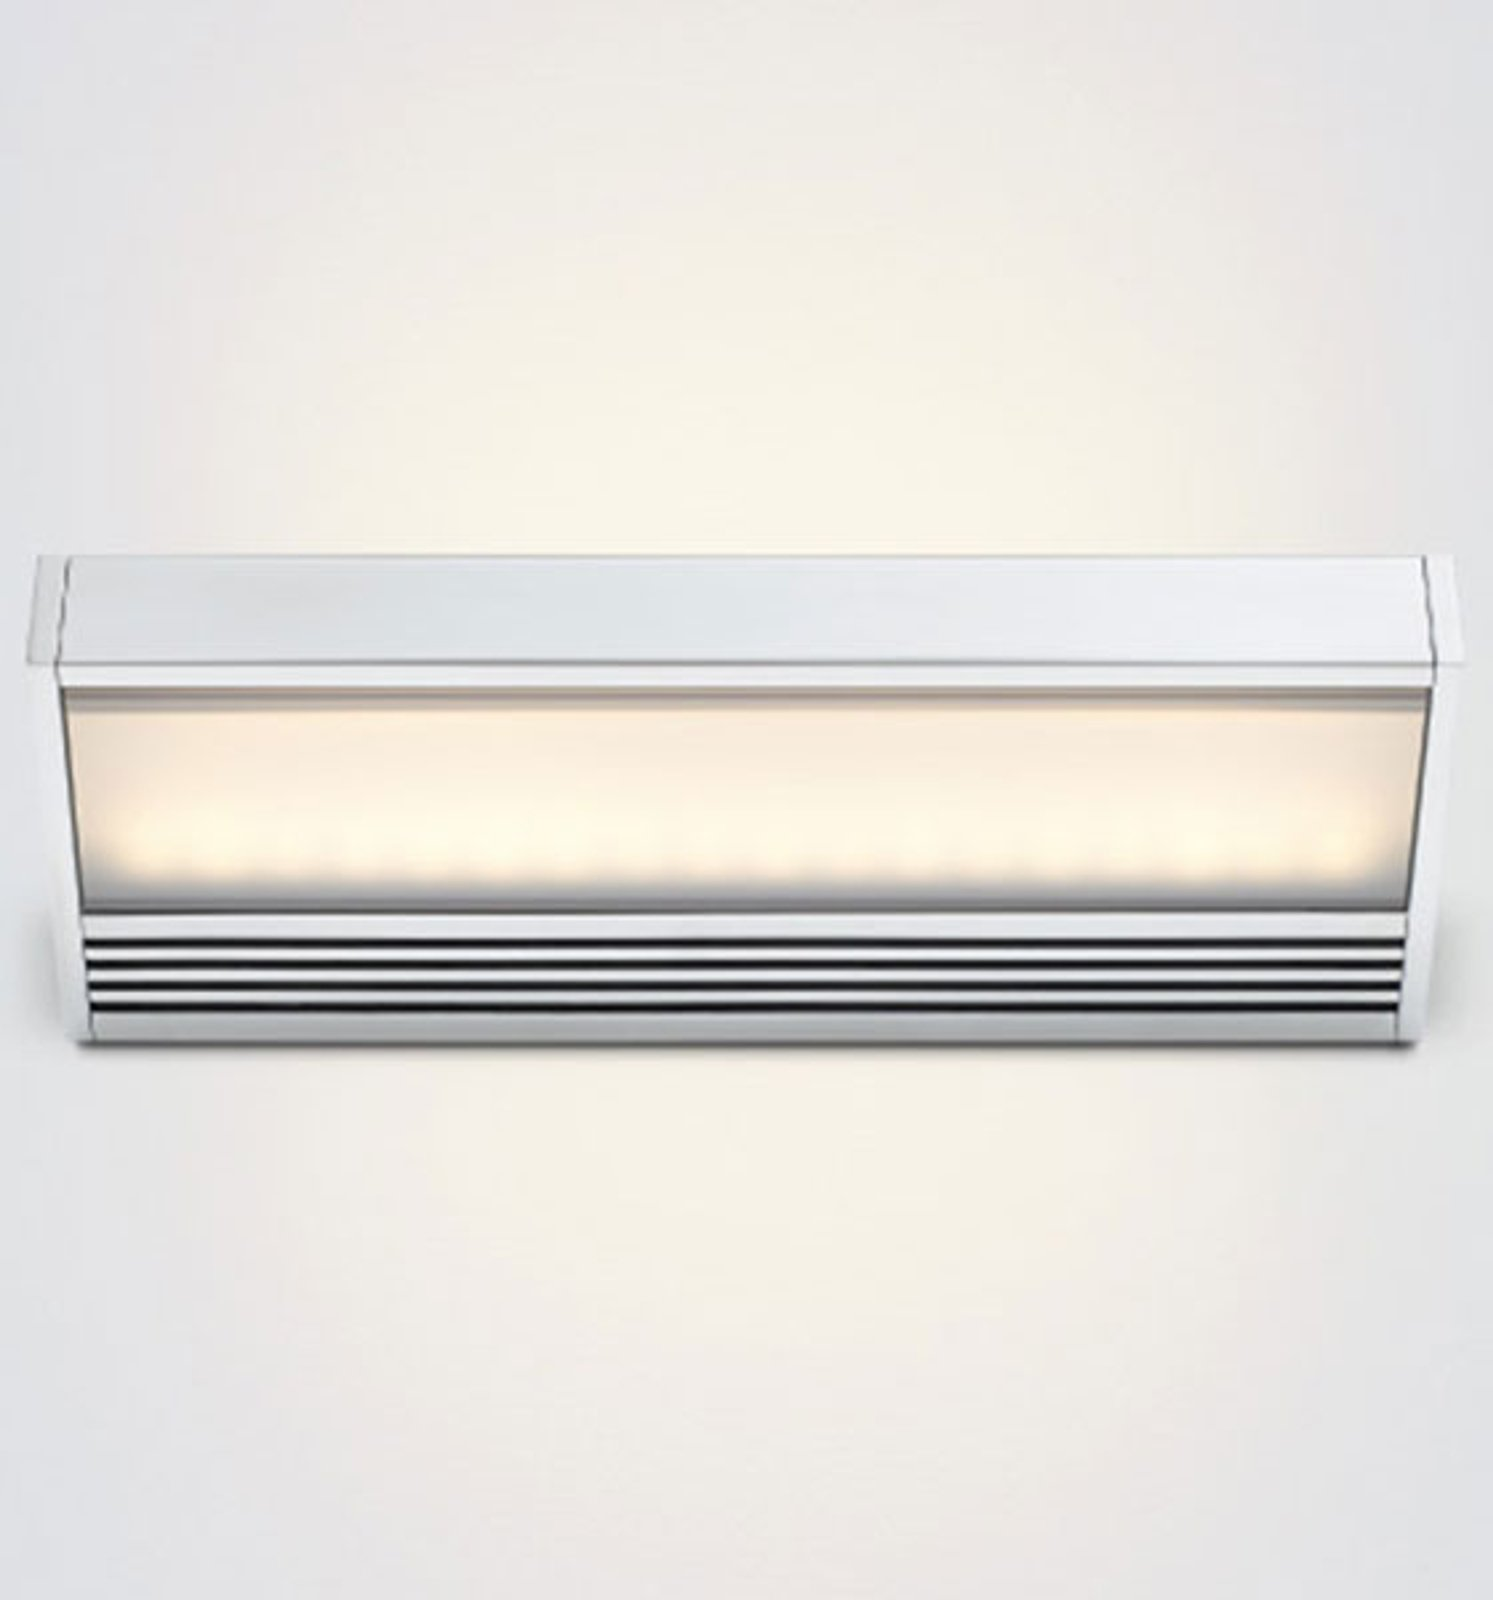 SML LED wall lamp made of polished aluminium